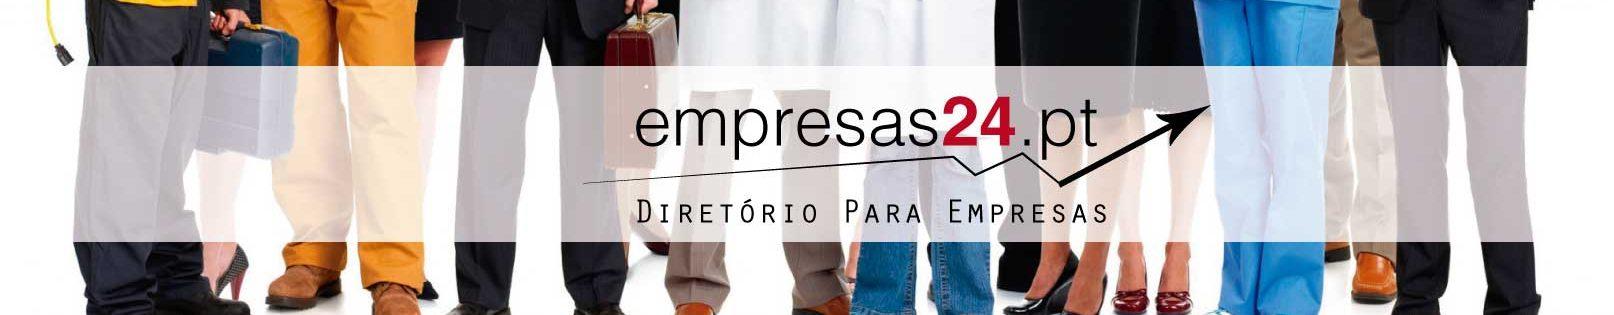 Empresas24.pt